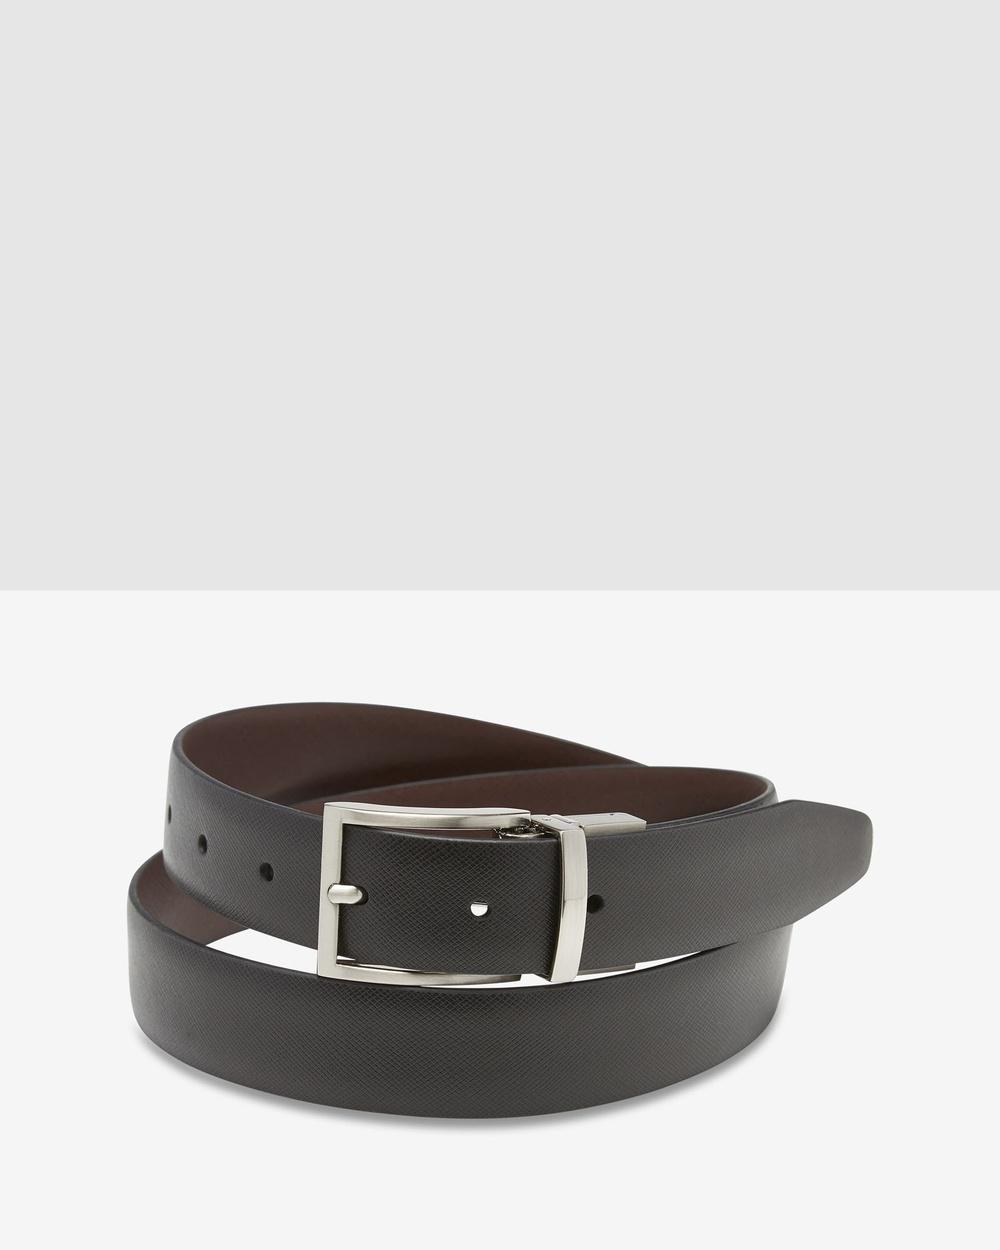 Oxford Harrison Reversible Belt Belts Black/Dark Brown